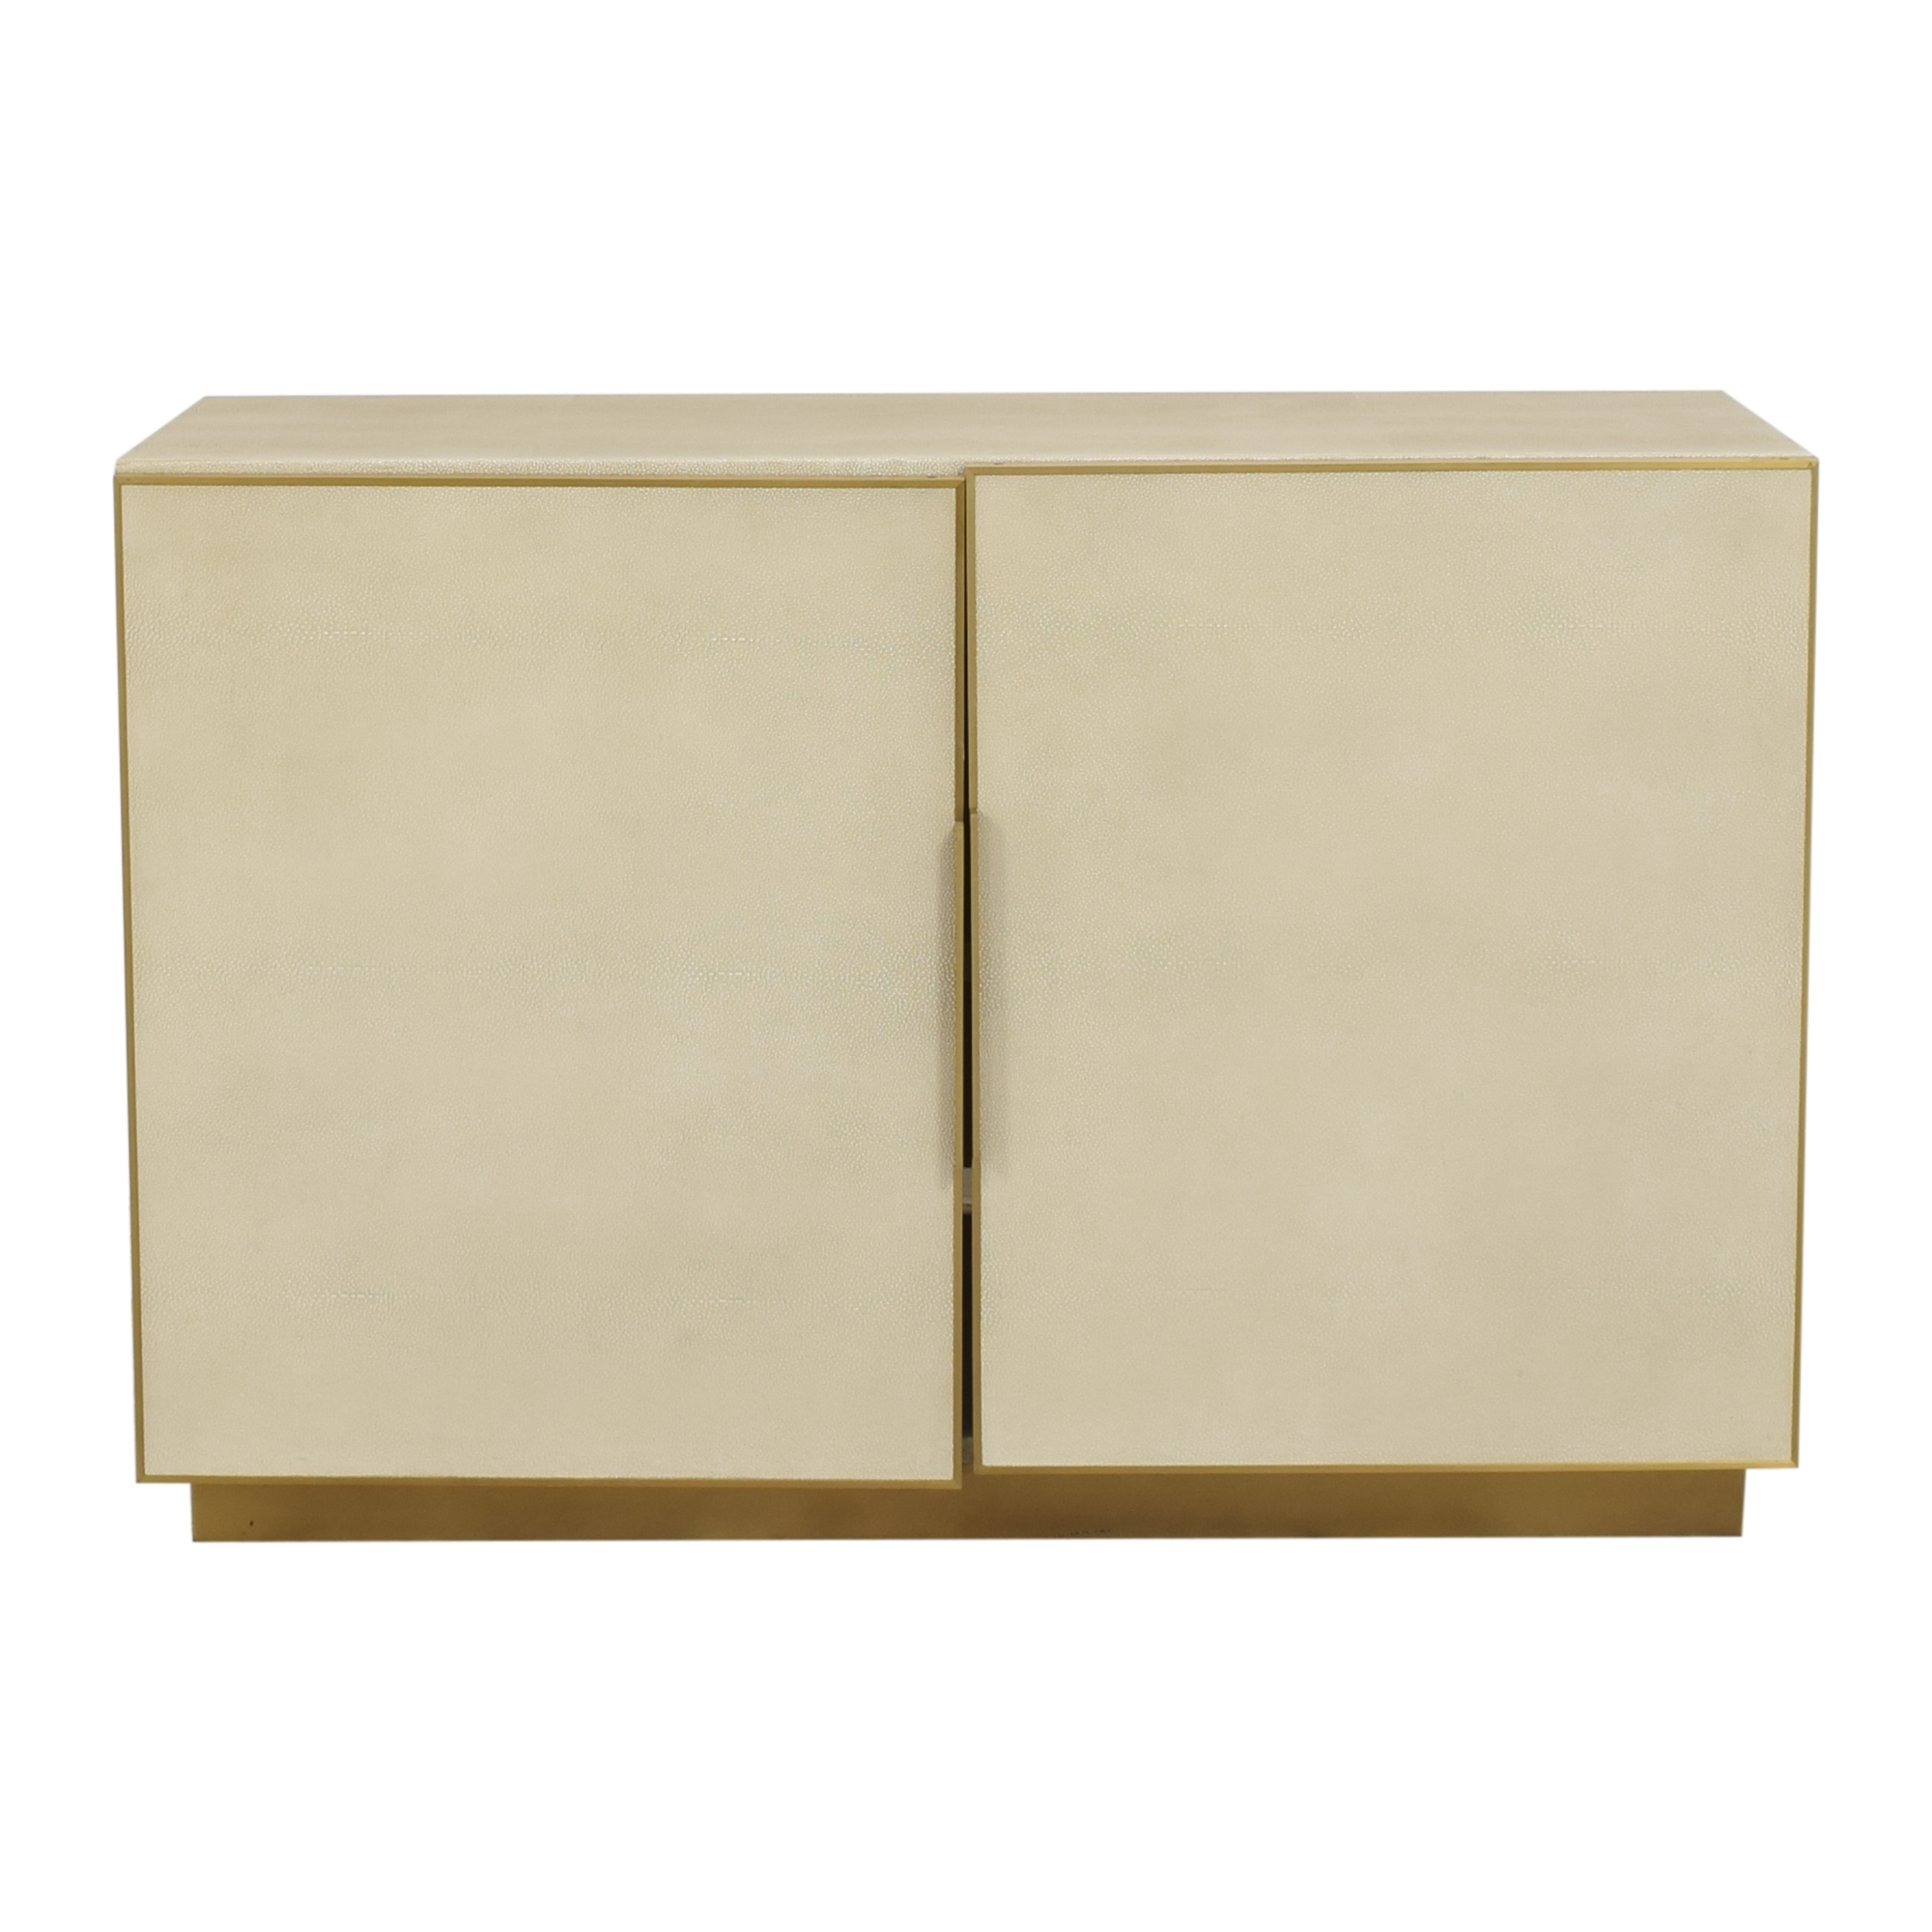 Restoration Hardware Restoration Hardware Cela Panel Double Door Sideboard Cabinets & Sideboards